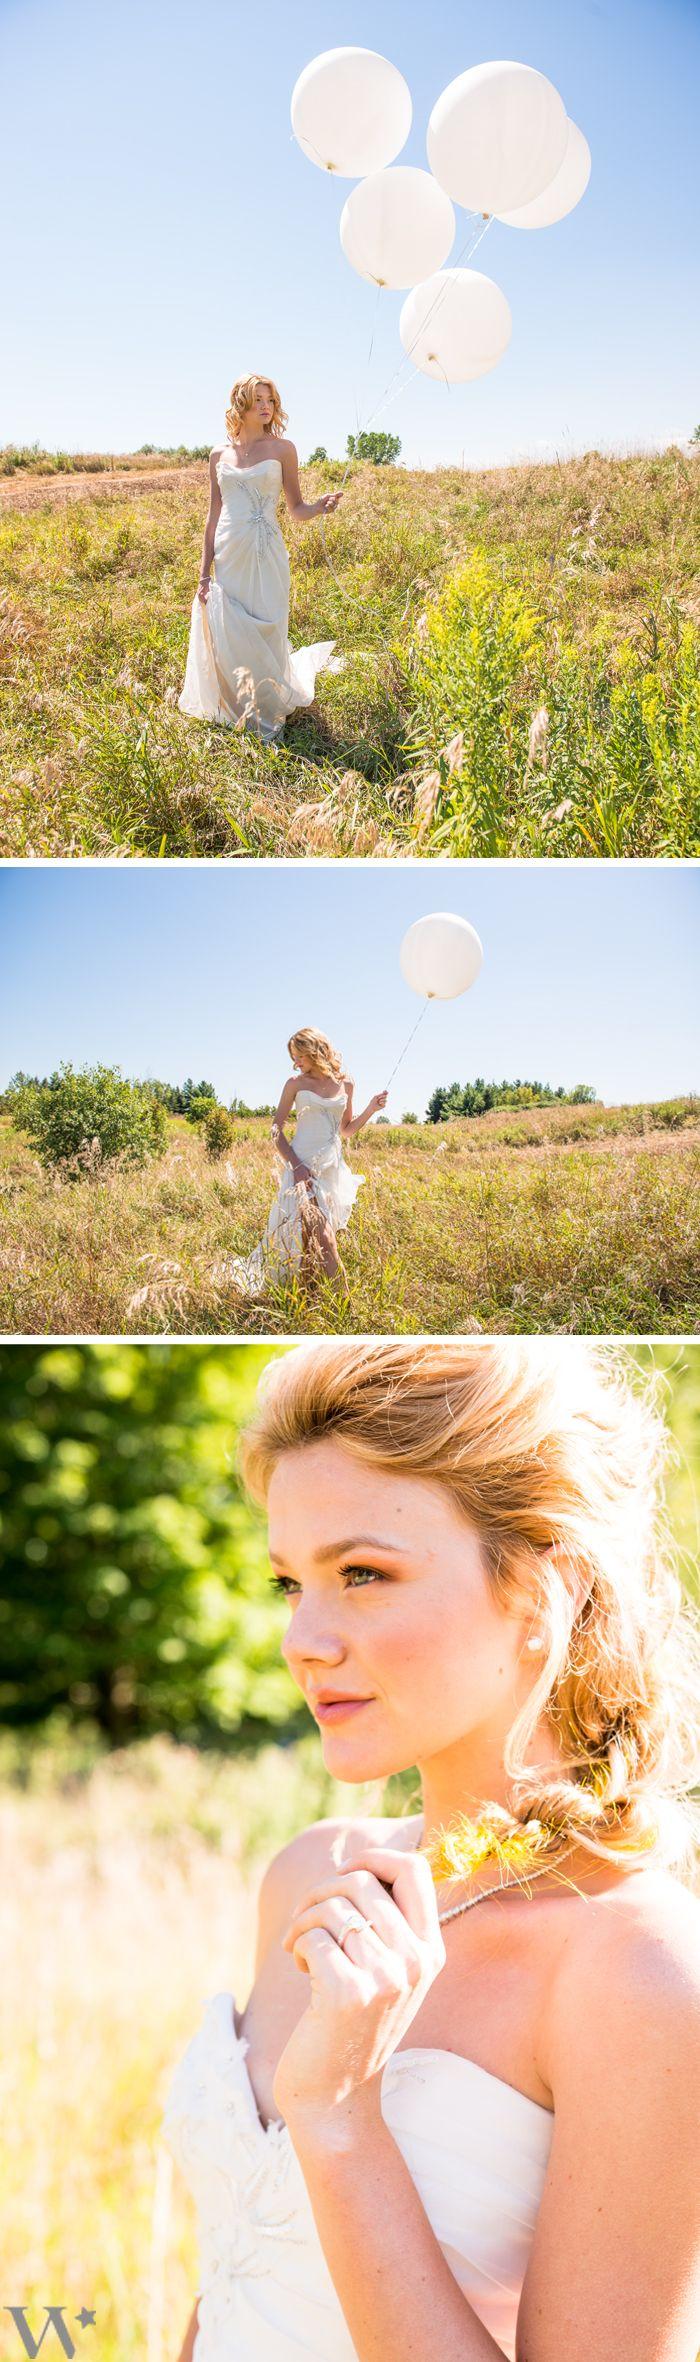 Bridal Beauty: Wanderlust Wedding. See all the inspirations here: http://www.weddingstar.com/e-catalog